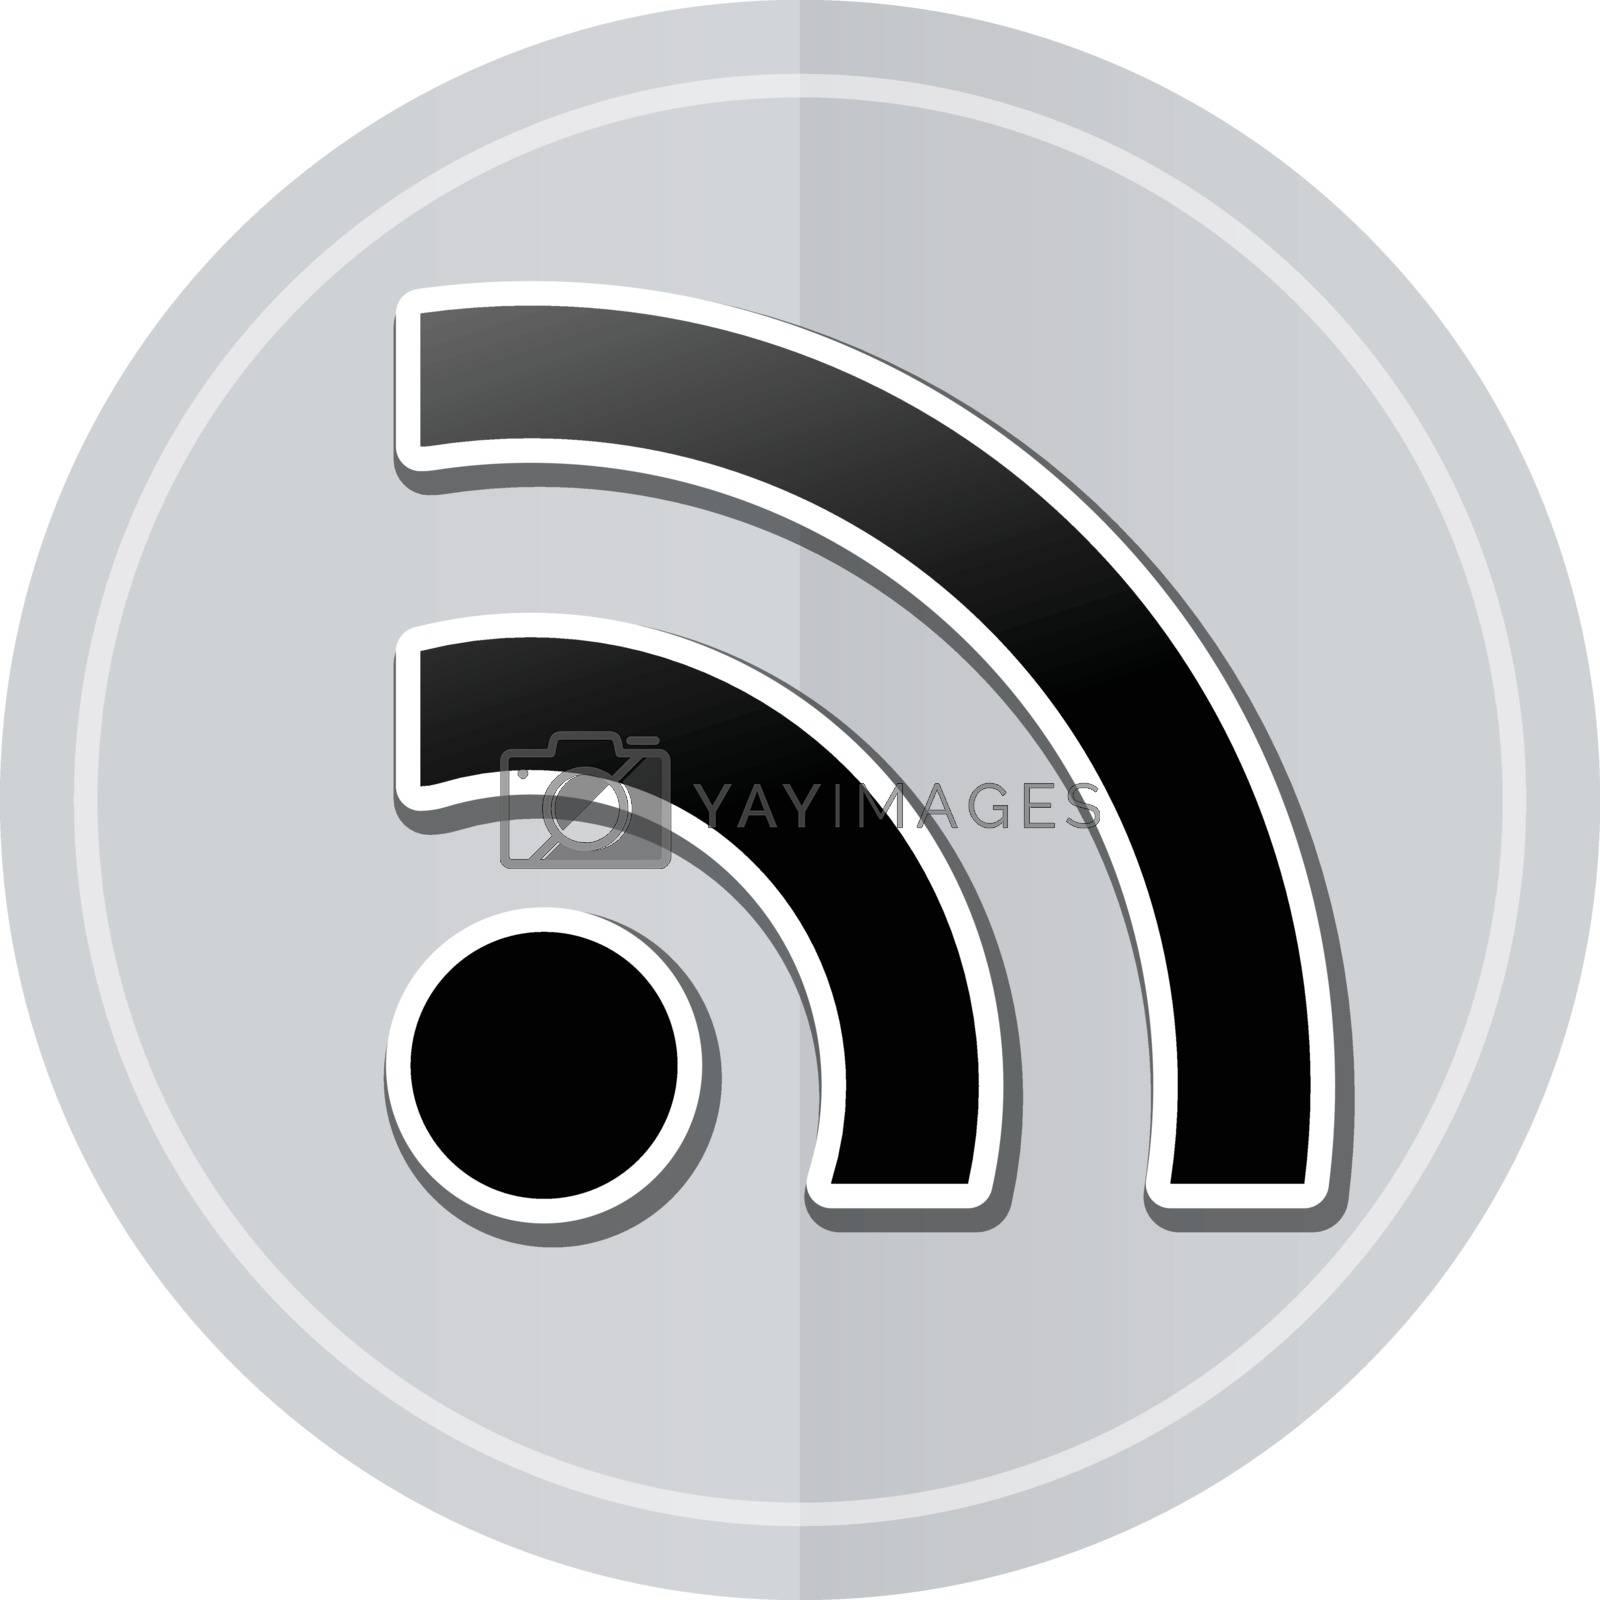 Illustration of wifi sticker icon simple design